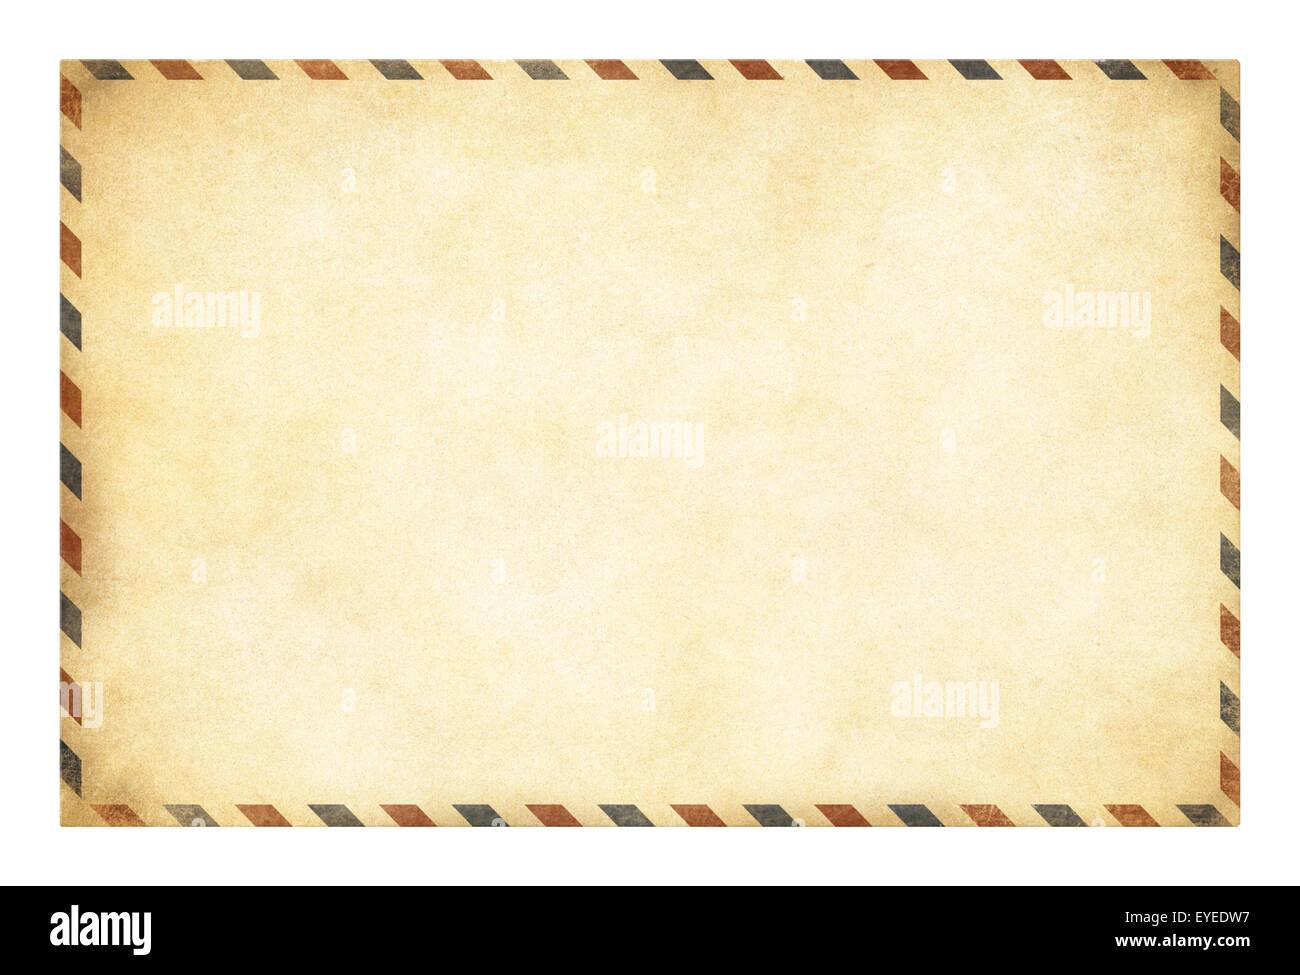 Fantastisch Alte Postkarte Vorlage Galerie - Entry Level Resume ...